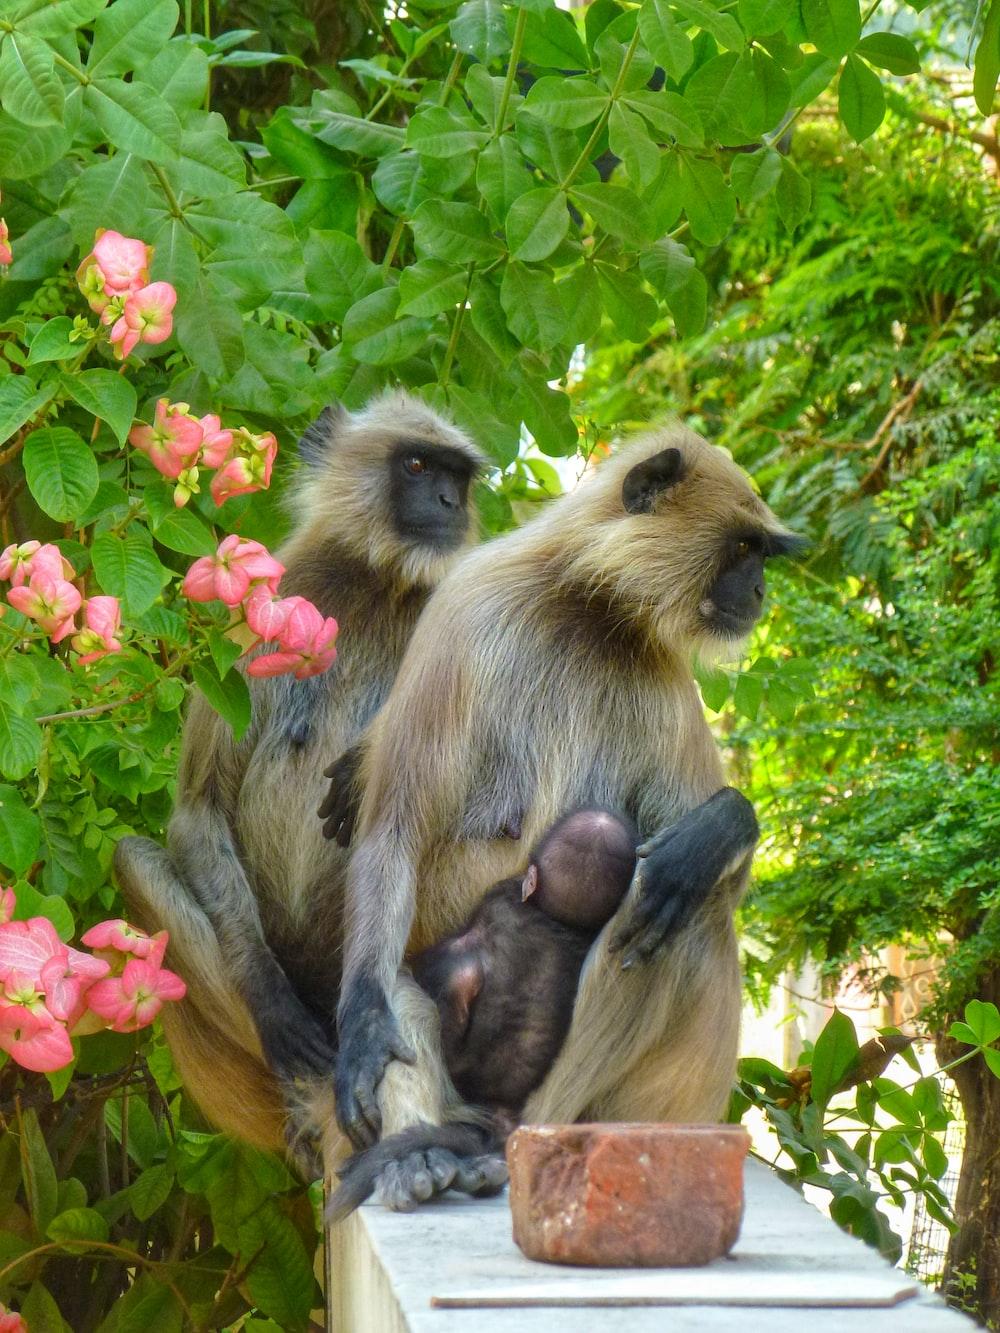 brown monkey sitting on brown tree branch during daytime